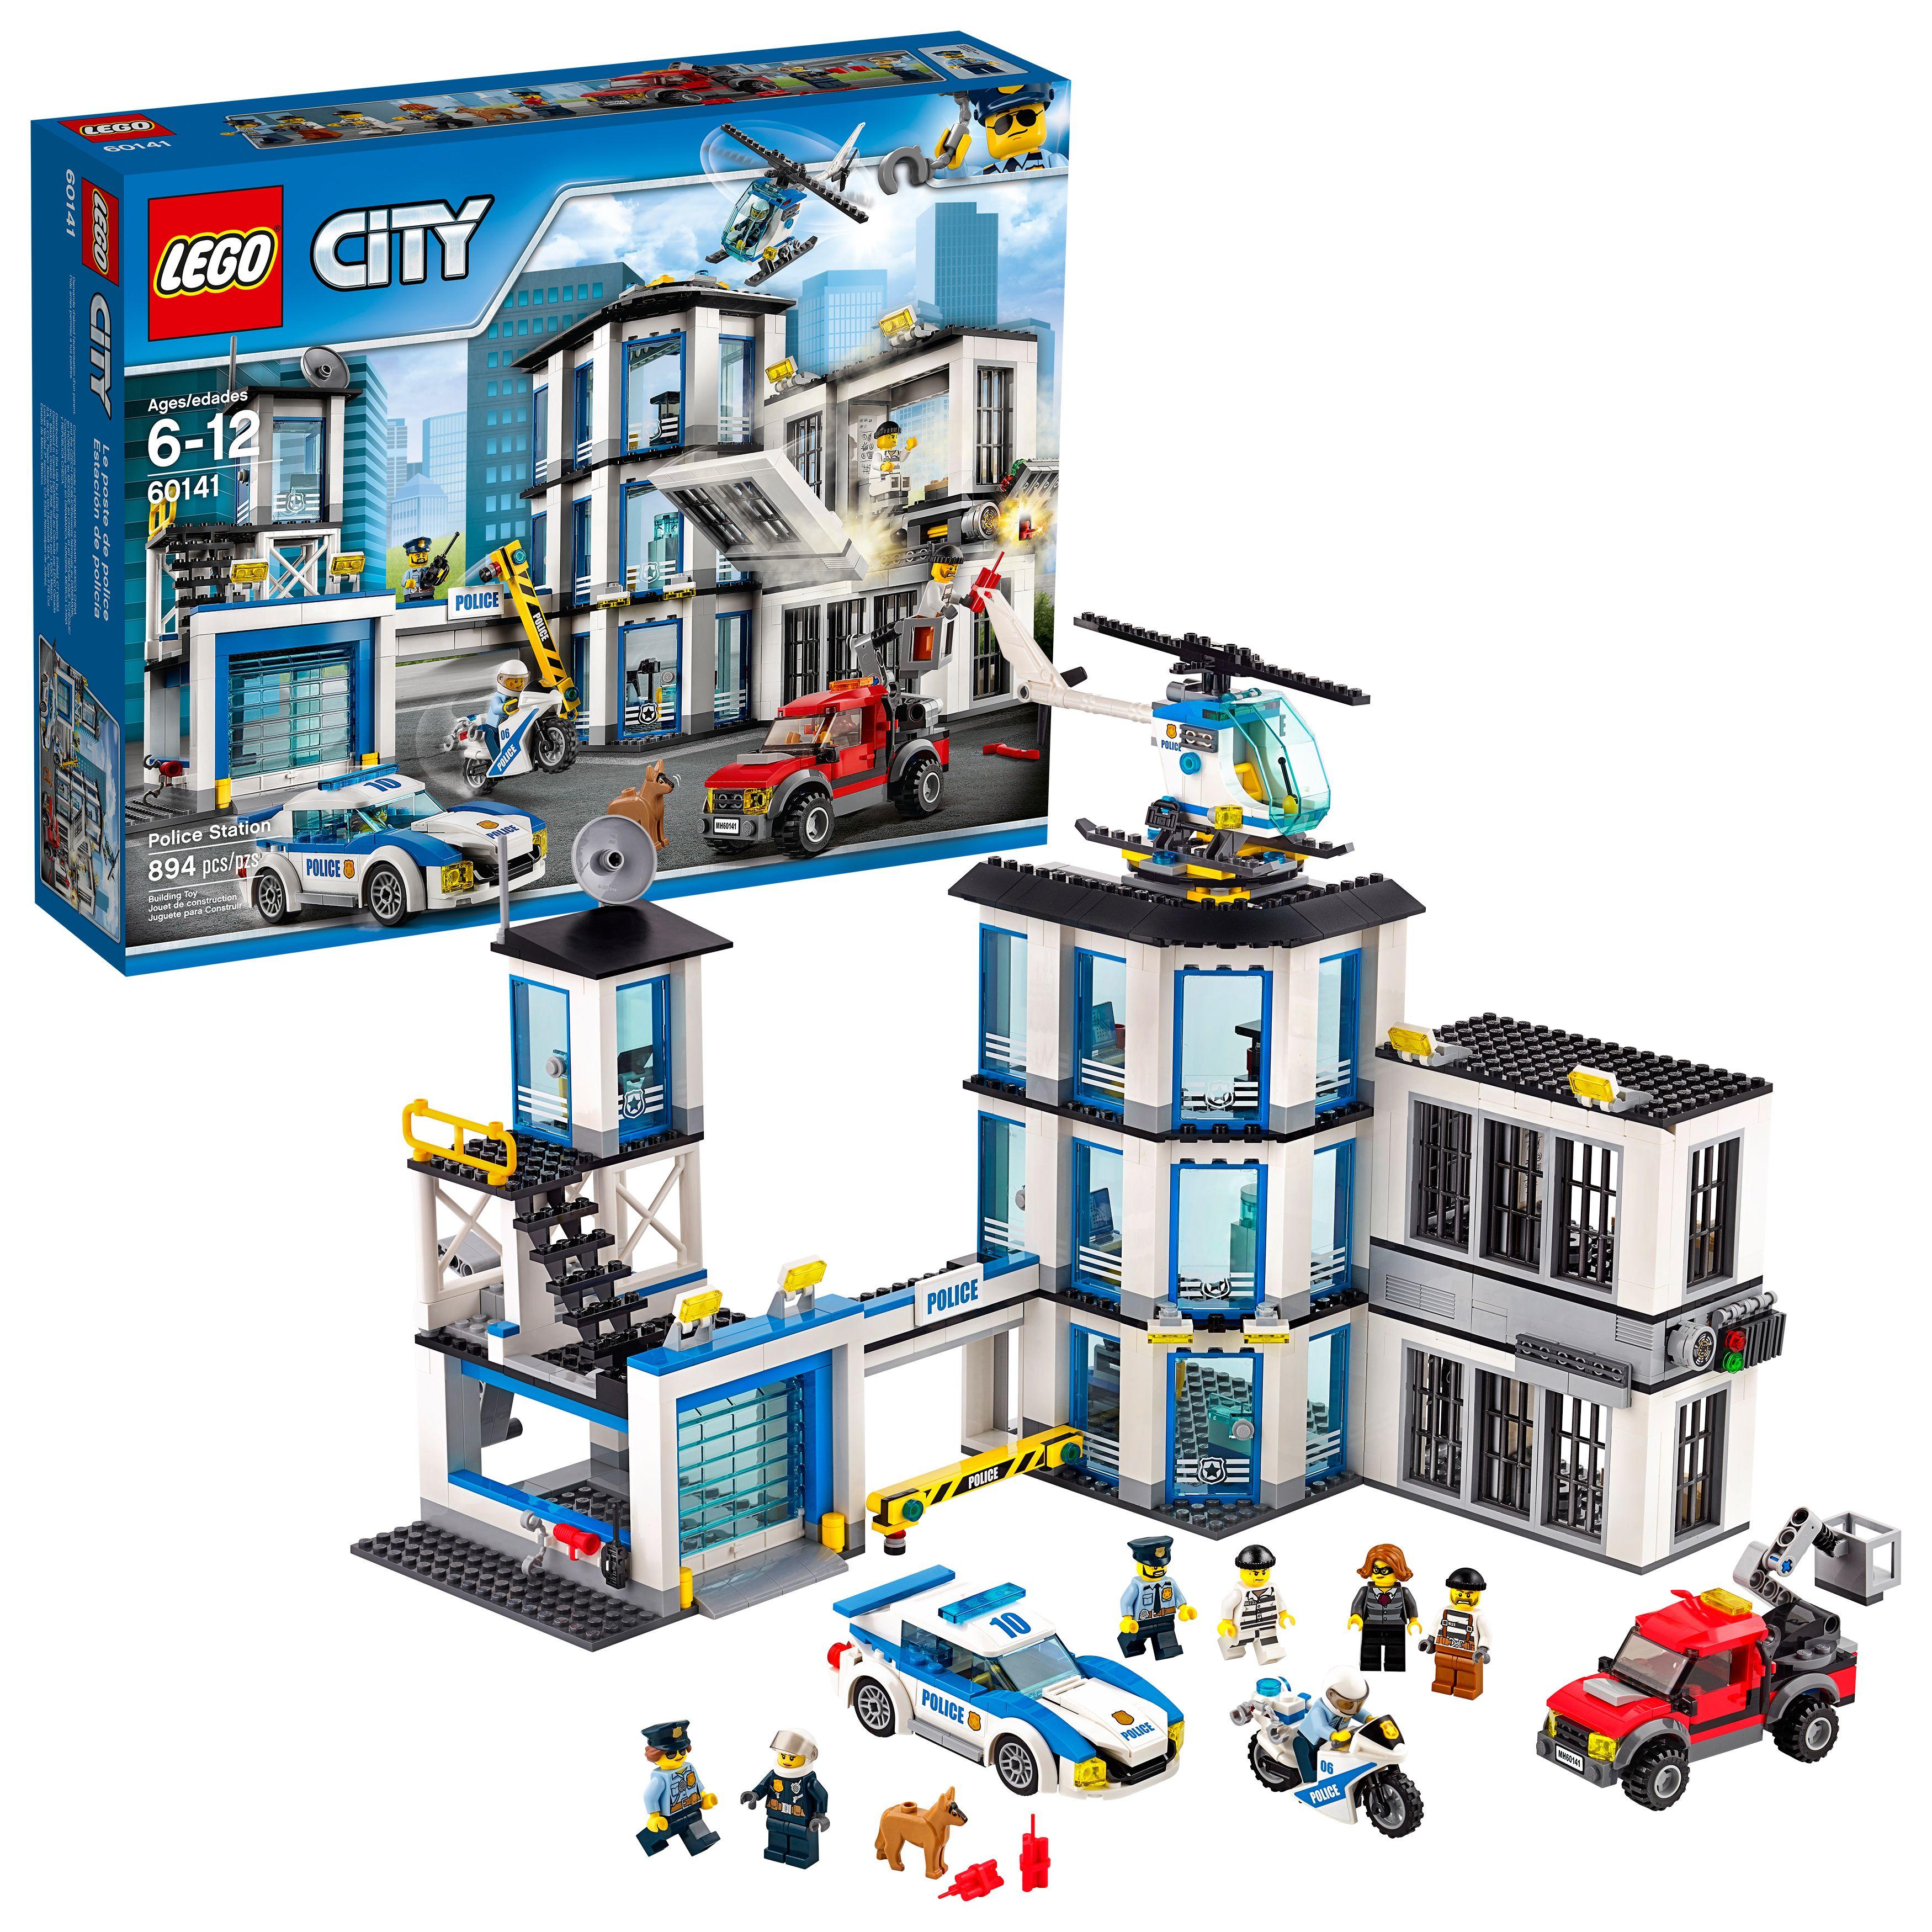 Lego City Police Station 60141 Building Set 894 Pieces Walmart Com Lego City Police Station Lego City Police Lego City Sets